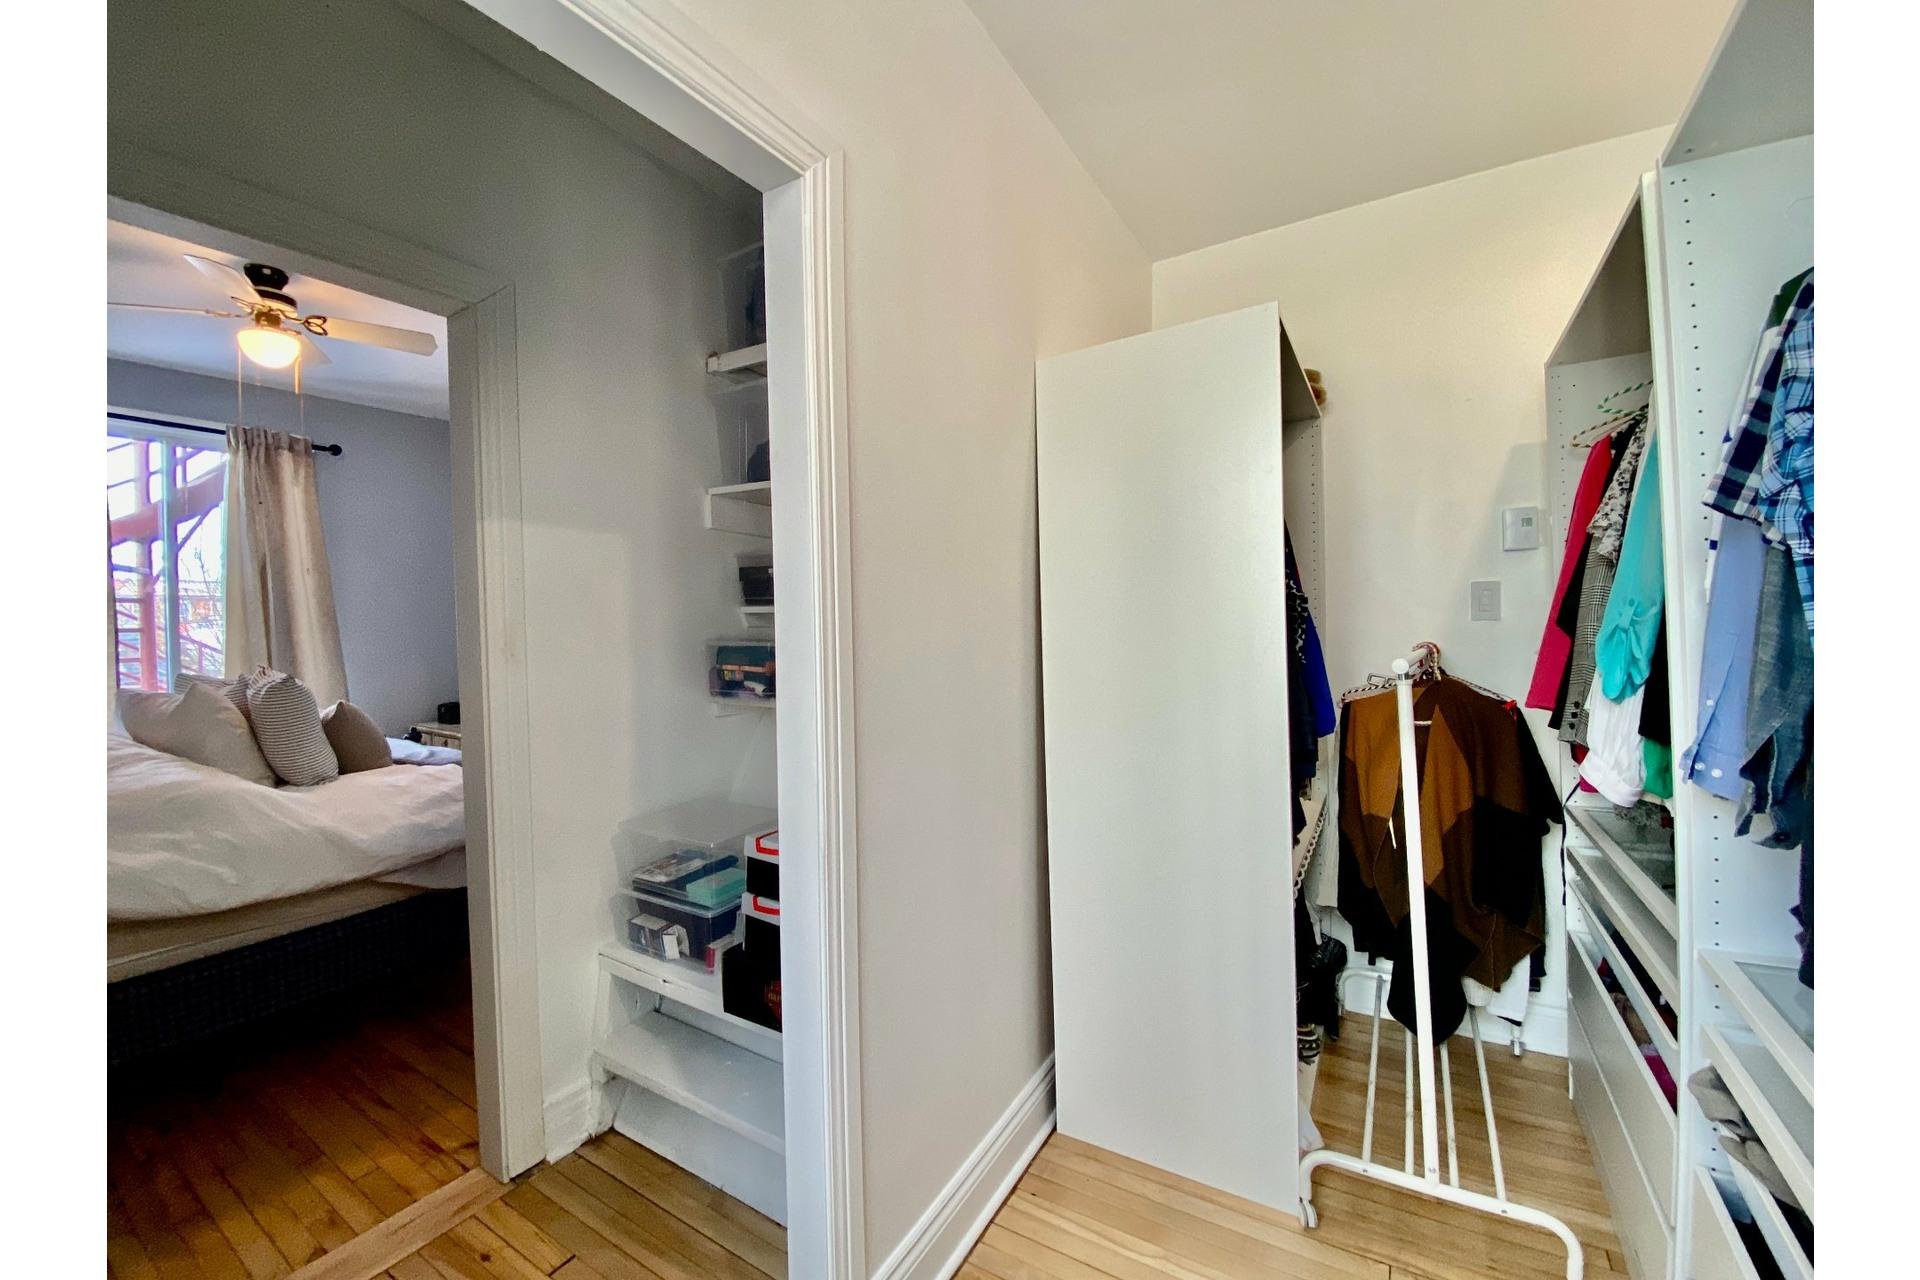 image 14 - Duplex En venta Lachine Montréal  - 6 habitaciones